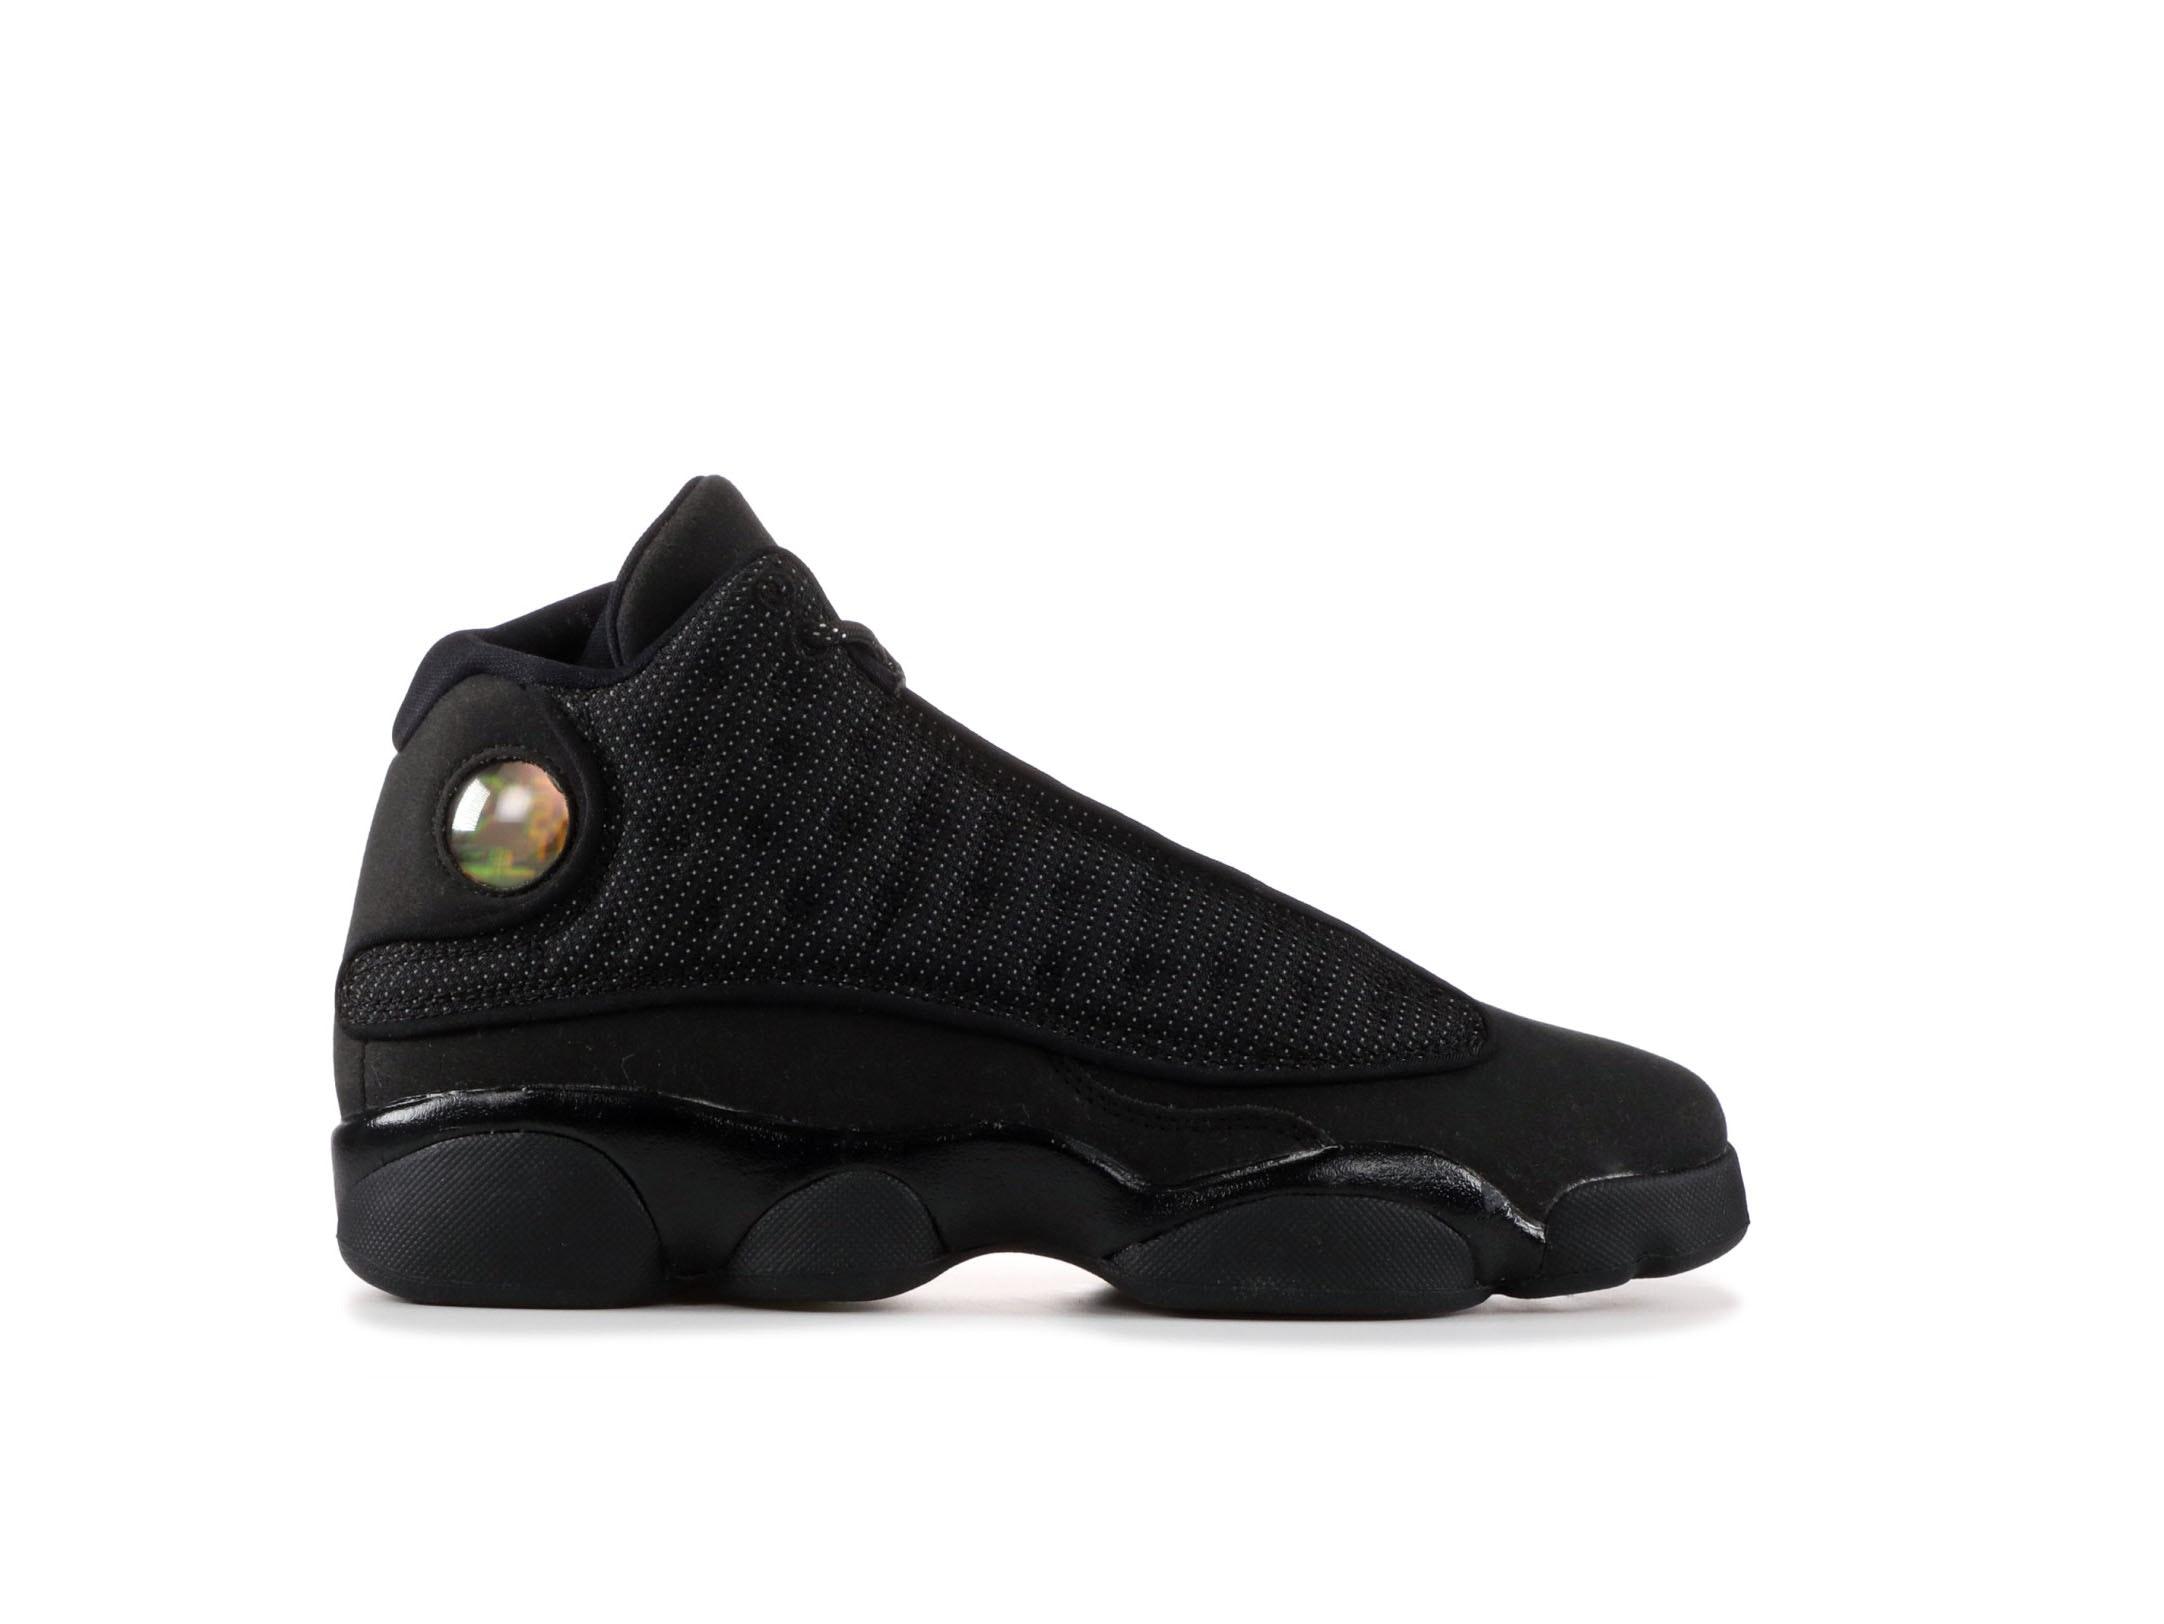 2447c8e3dd2 Shop Air Jordan 13 Retro GS Black Cat Online | Laced